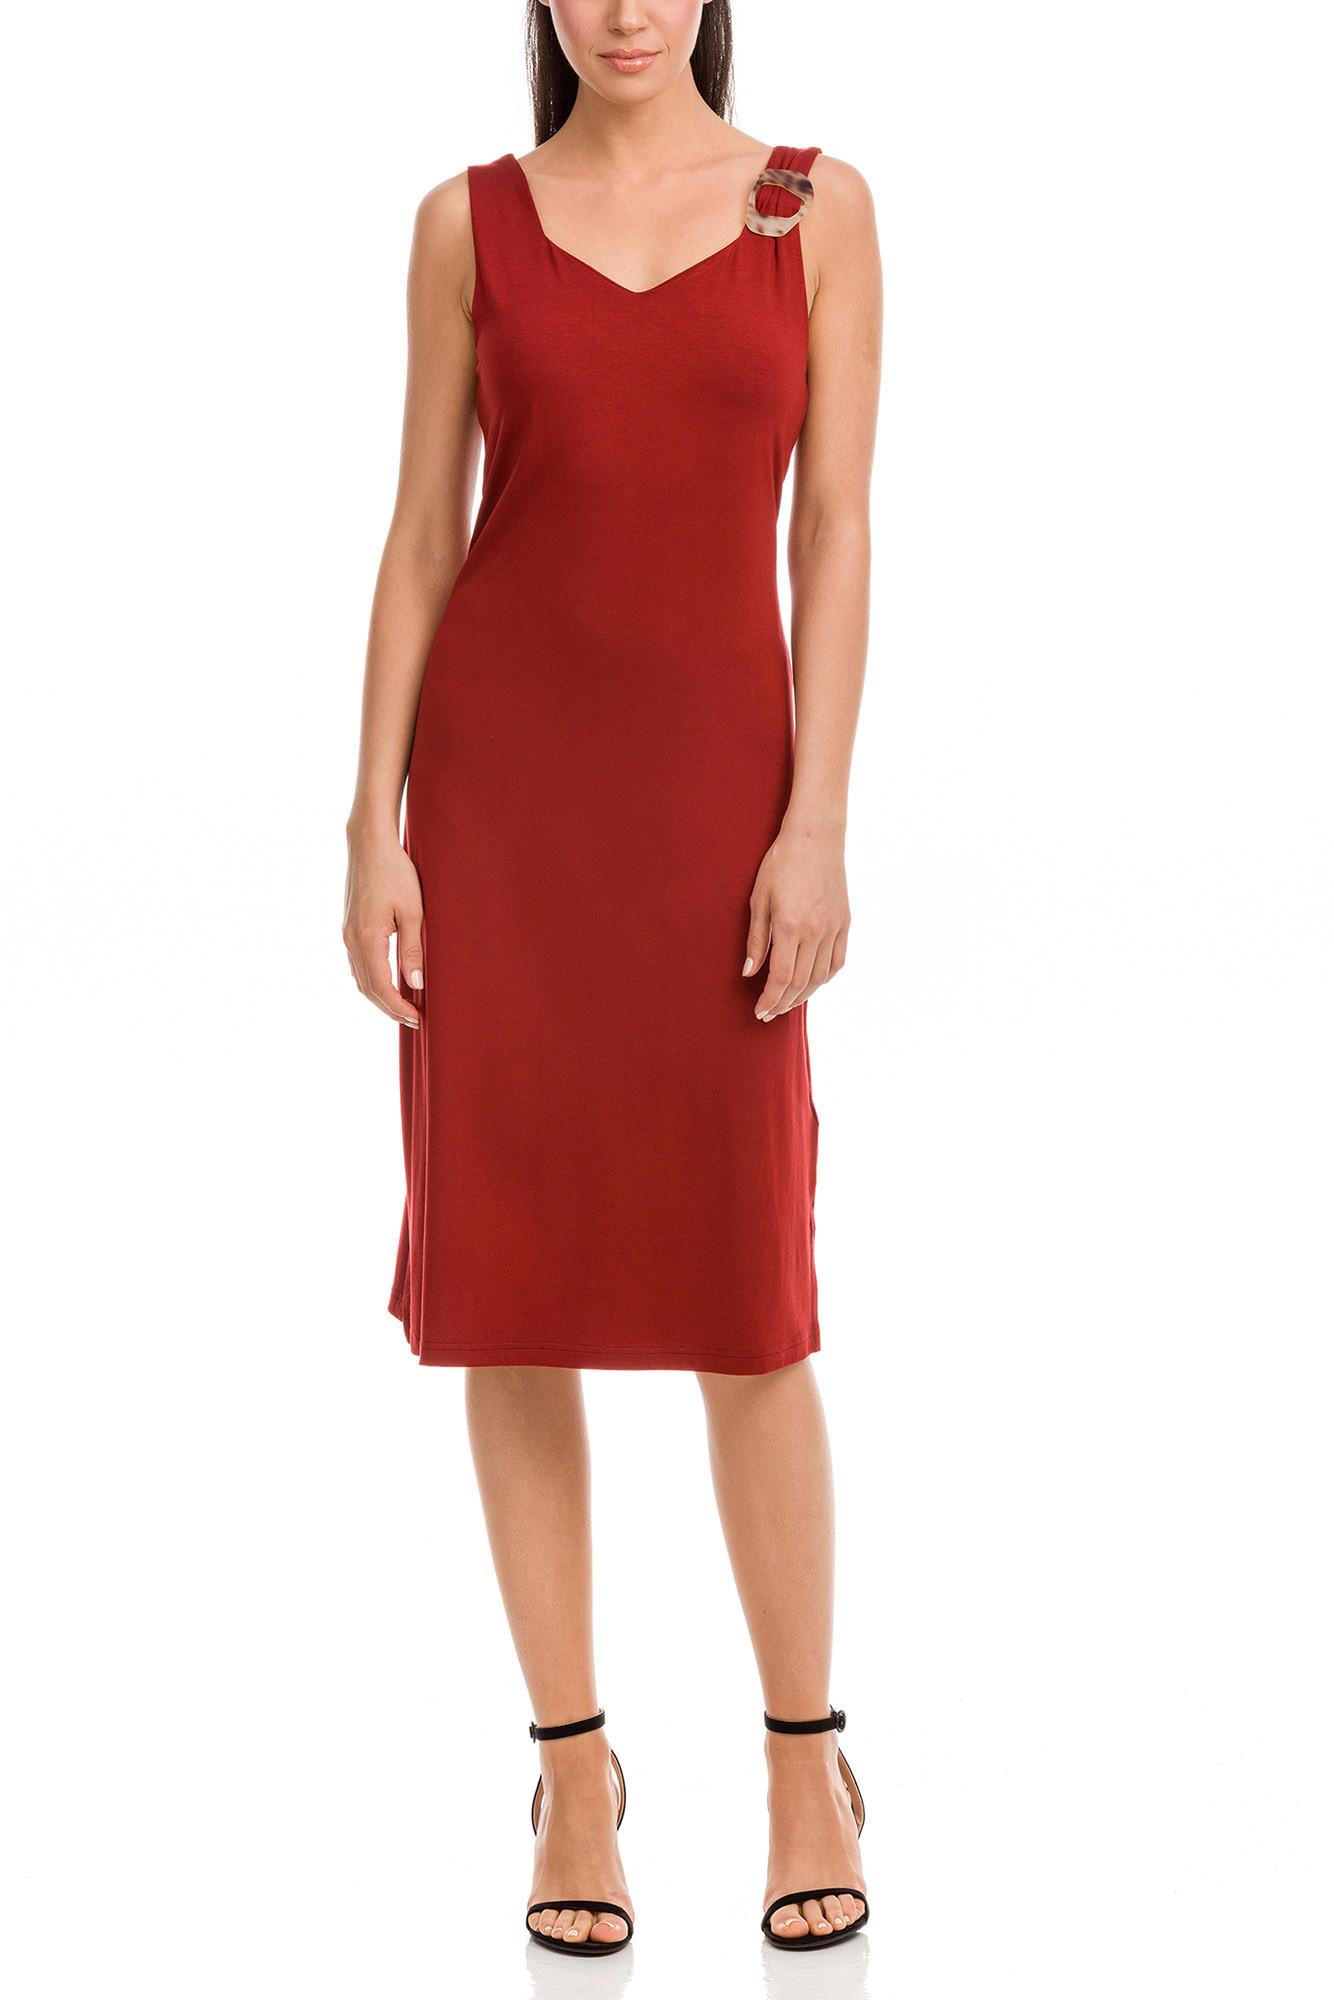 Vamp - Dámske šaty 12565 - Vamp red terracota s